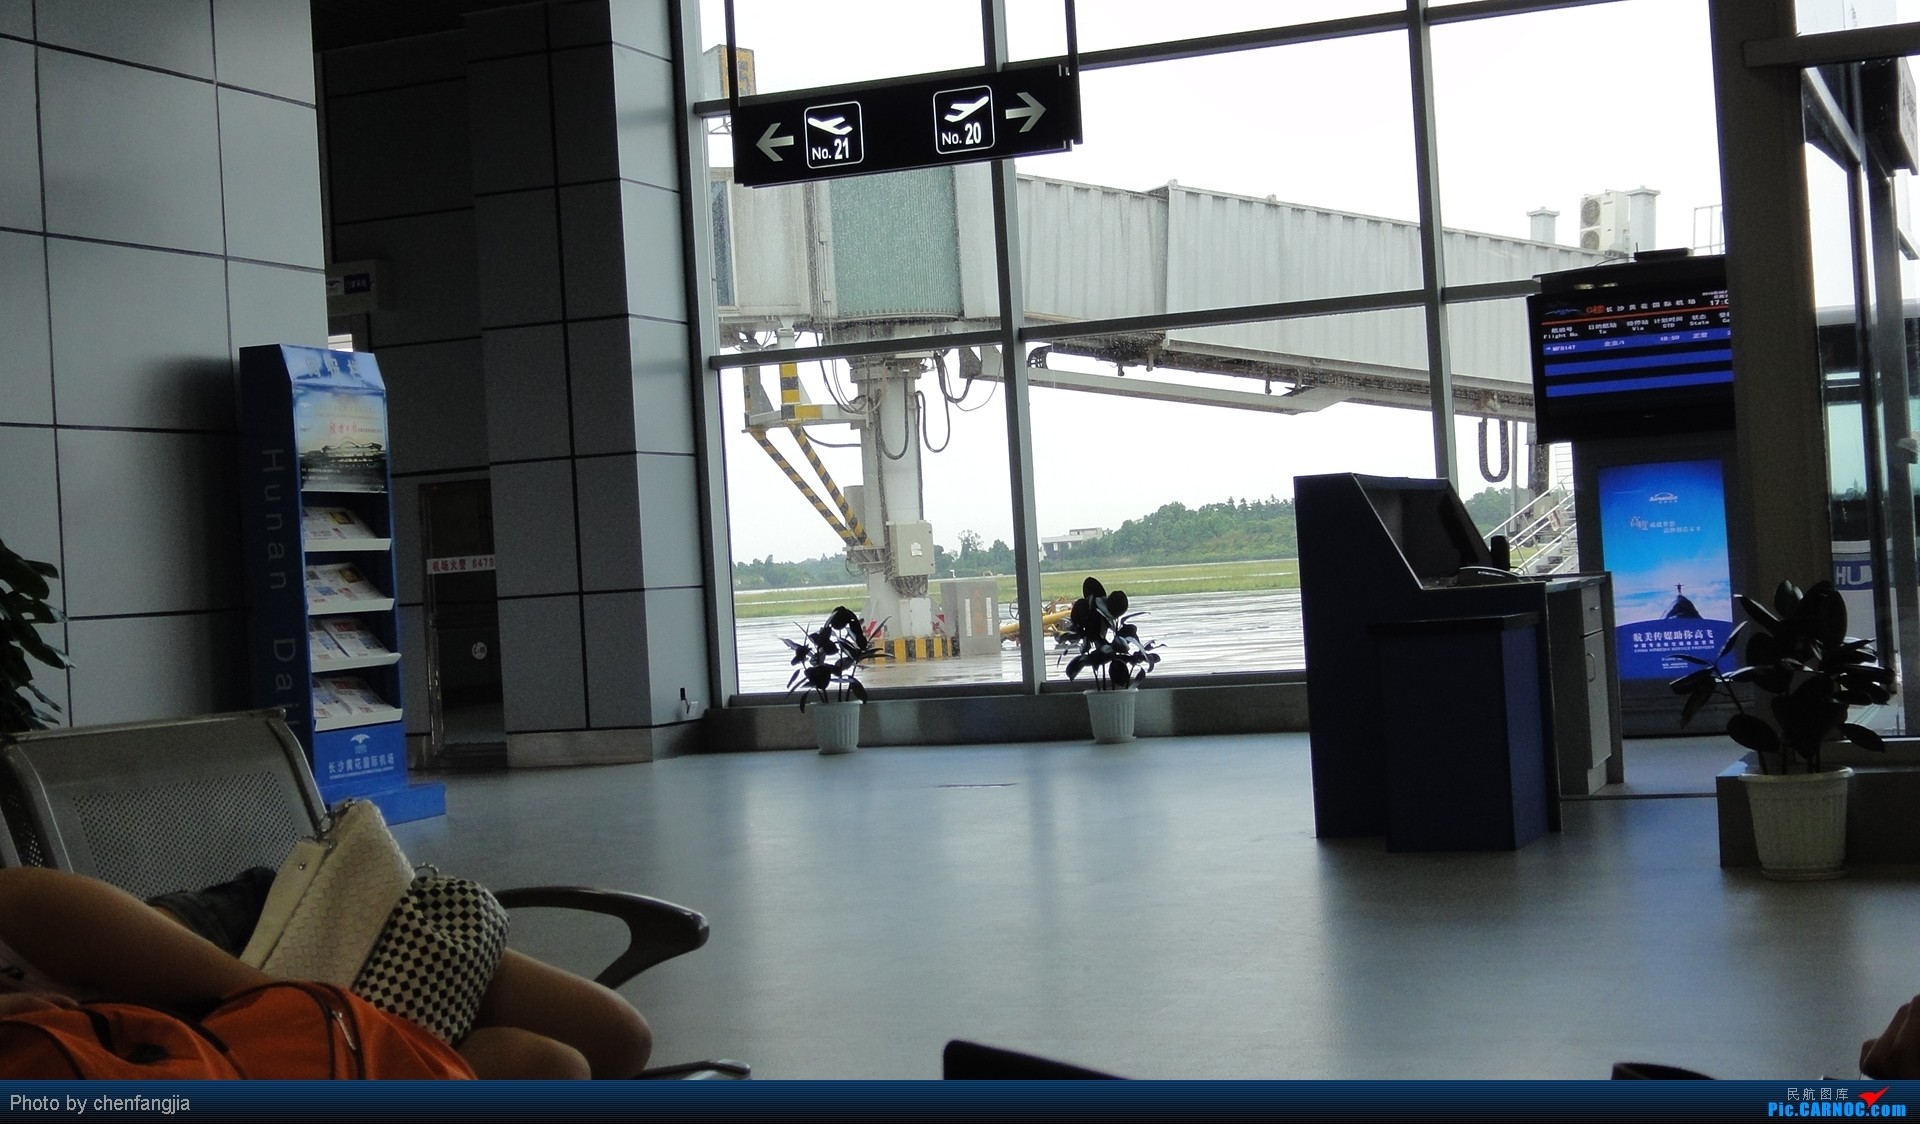 CSX-KMG 长沙黄花—昆明乌家坝  CZ3467  ---------标题要长--- AIRBUS A320-200 B-6303 中国长沙黄花机场